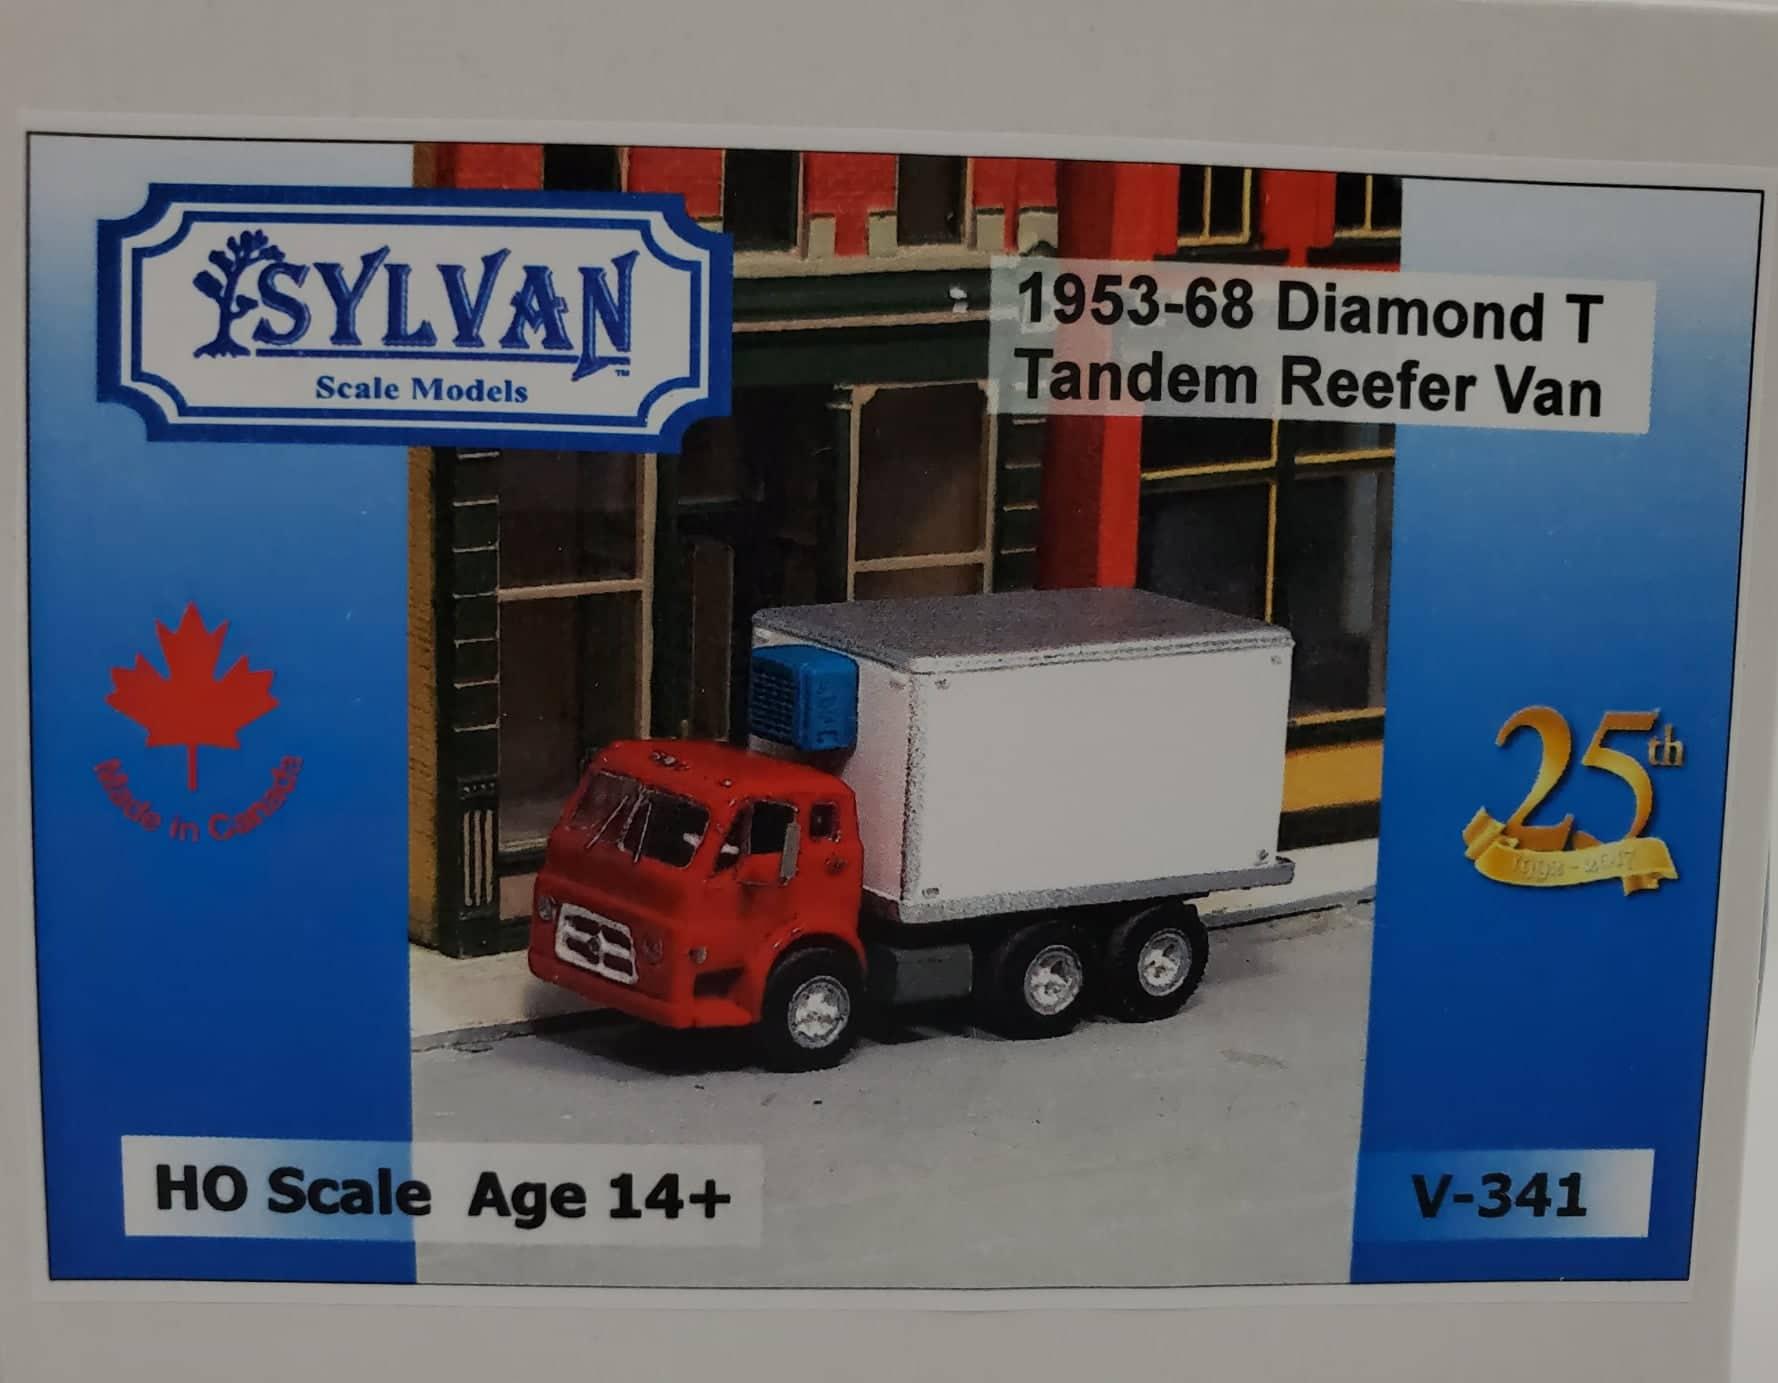 Sylvan Scale Models 341 HO Scale - 1953/68 Diamond T734 Tandem Reefer Van - Unpainted and Resin Cast Kit